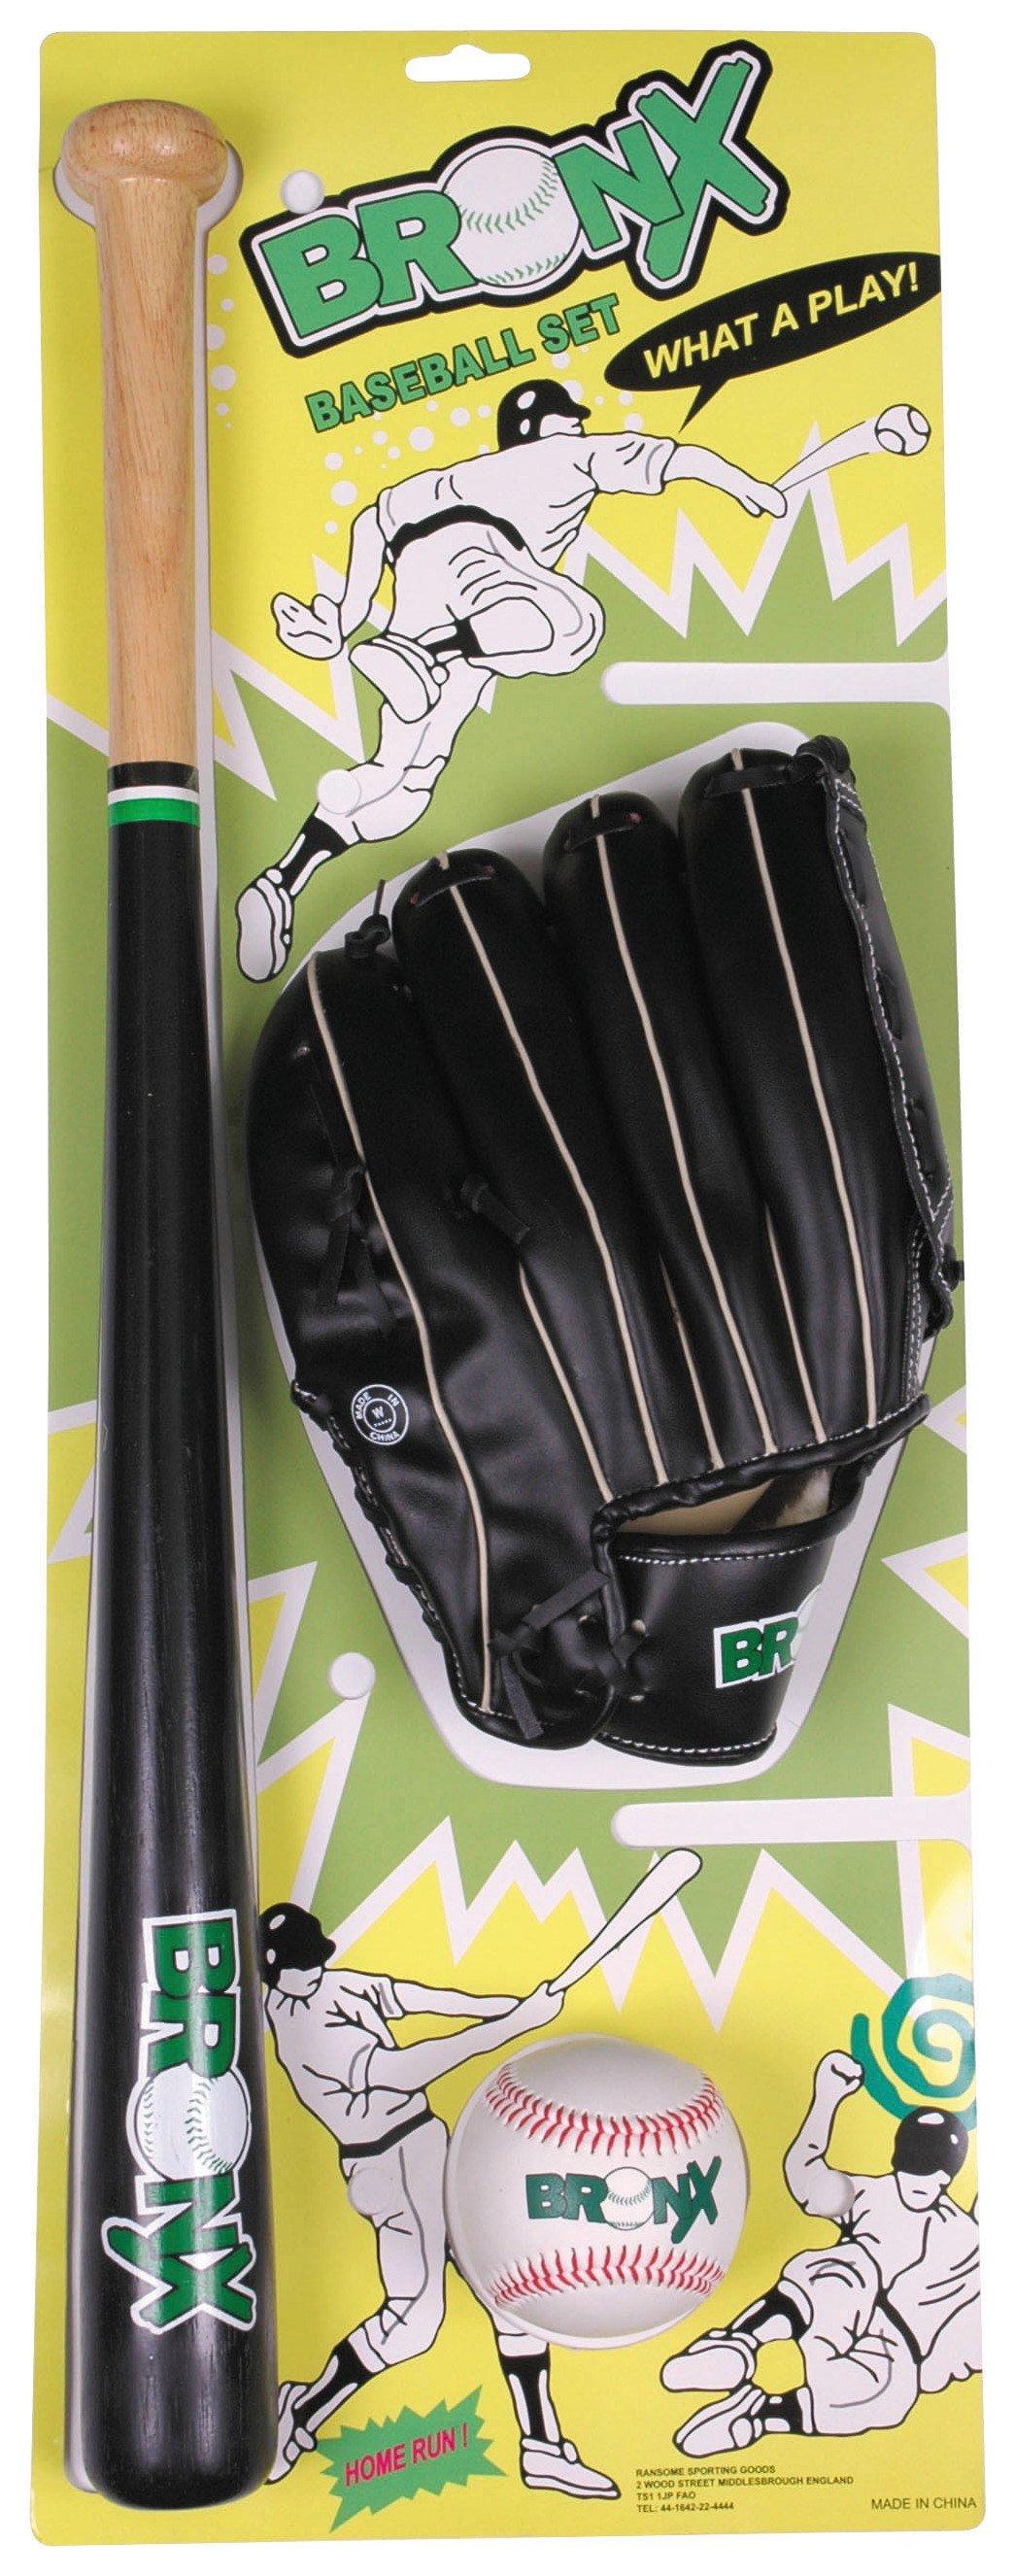 Image of Bronx - Wood Bat Ball and Glove Baseball Set